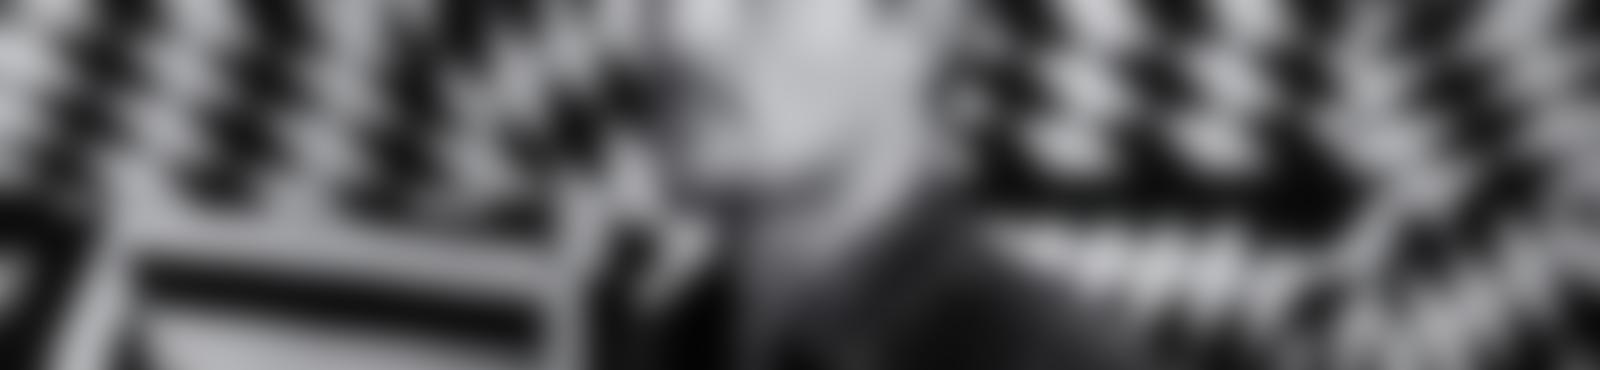 Blurred 7855ddac 70be 43e6 ae8b 7087ad6c0e77